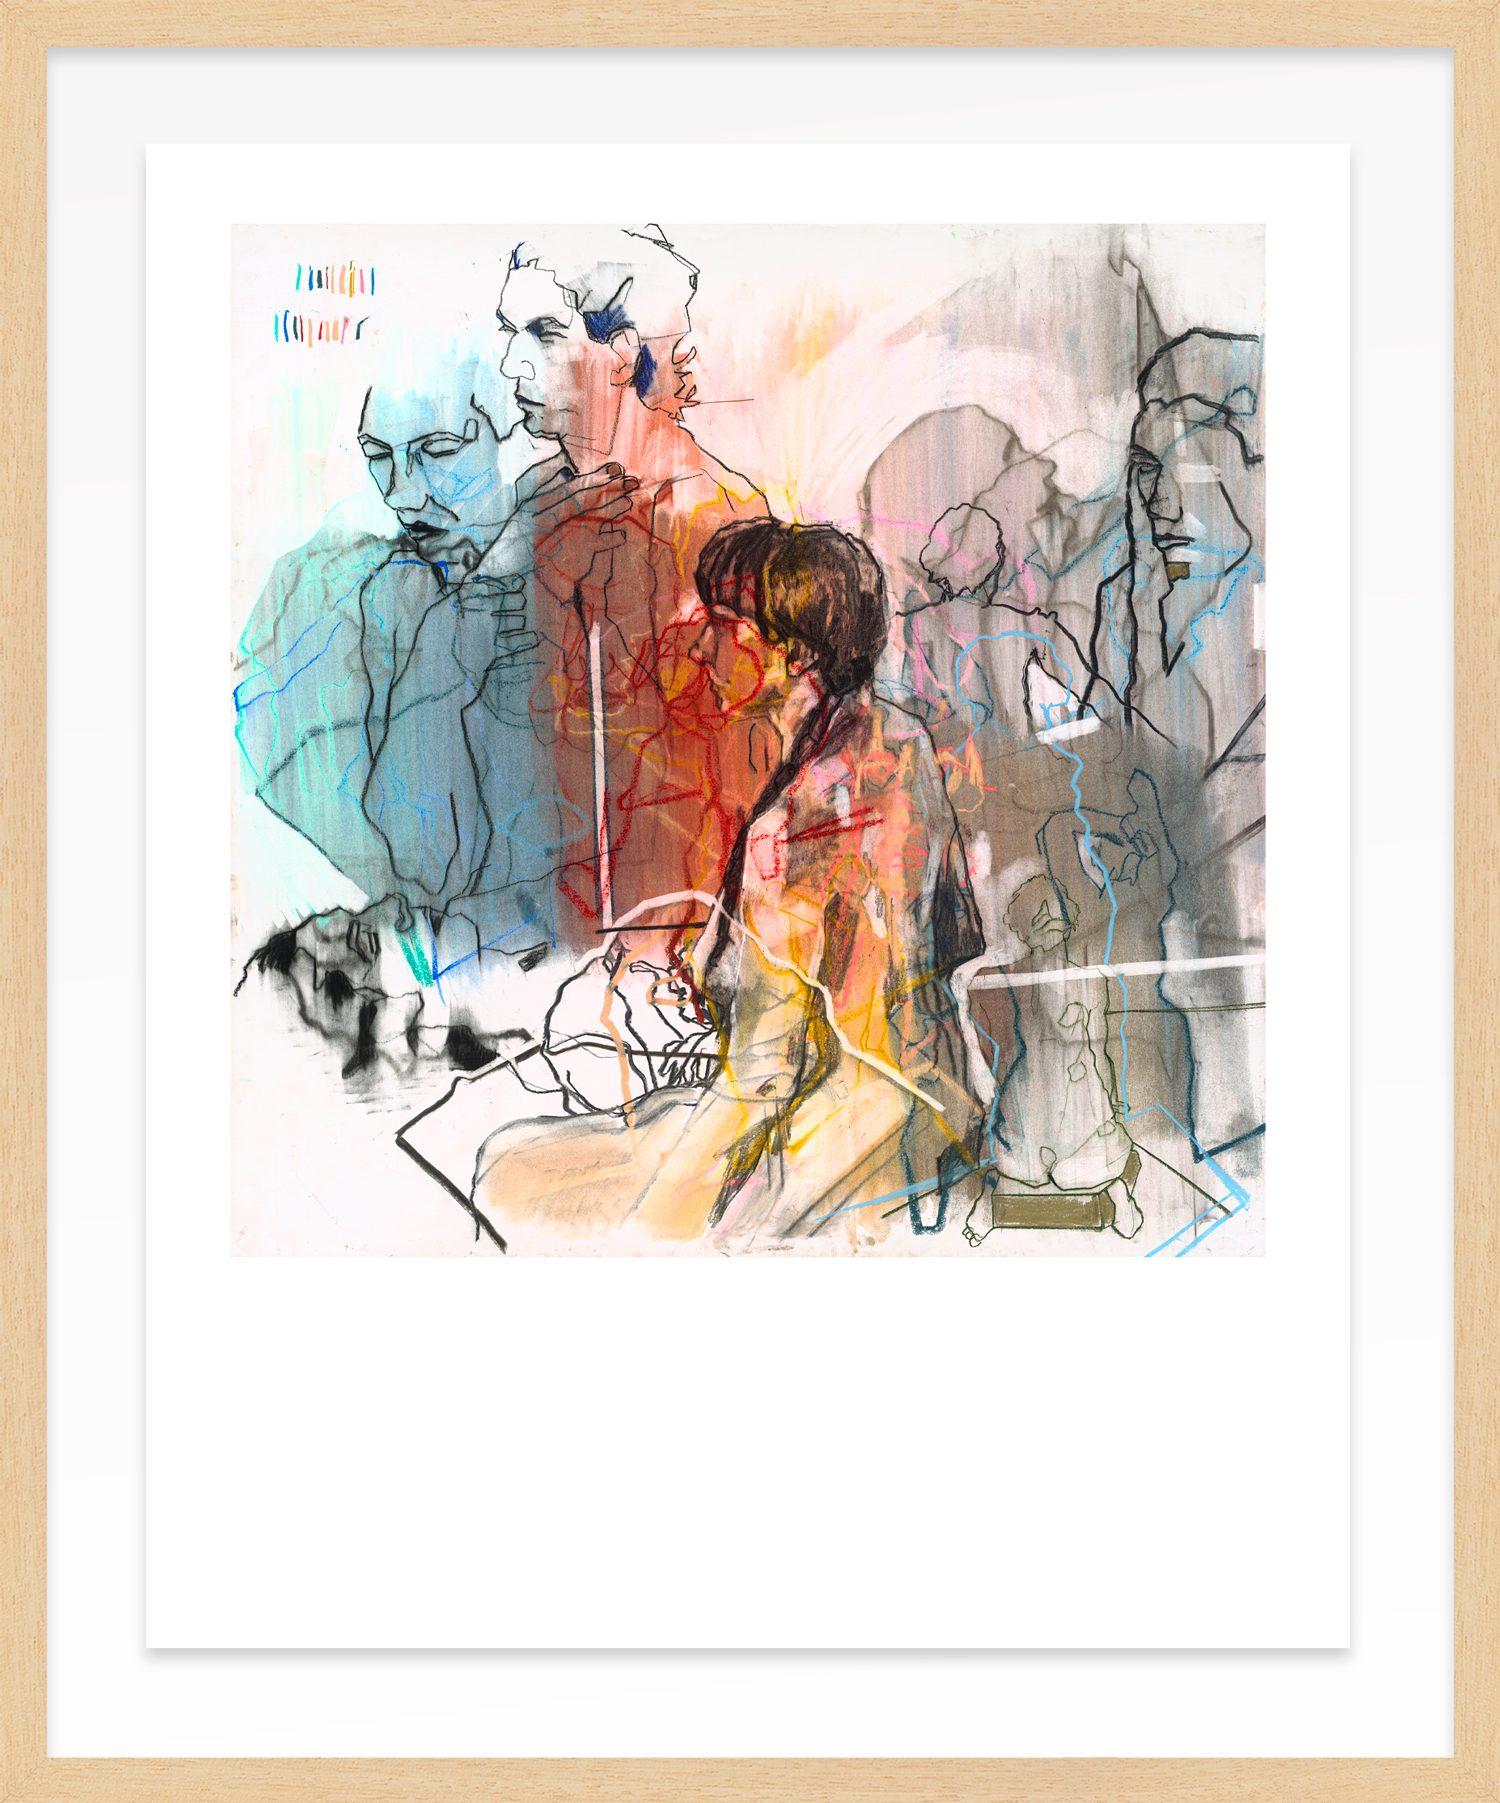 Hang Tough Reunion x David Hedderman Float Framed in Ayous (Framing Only)